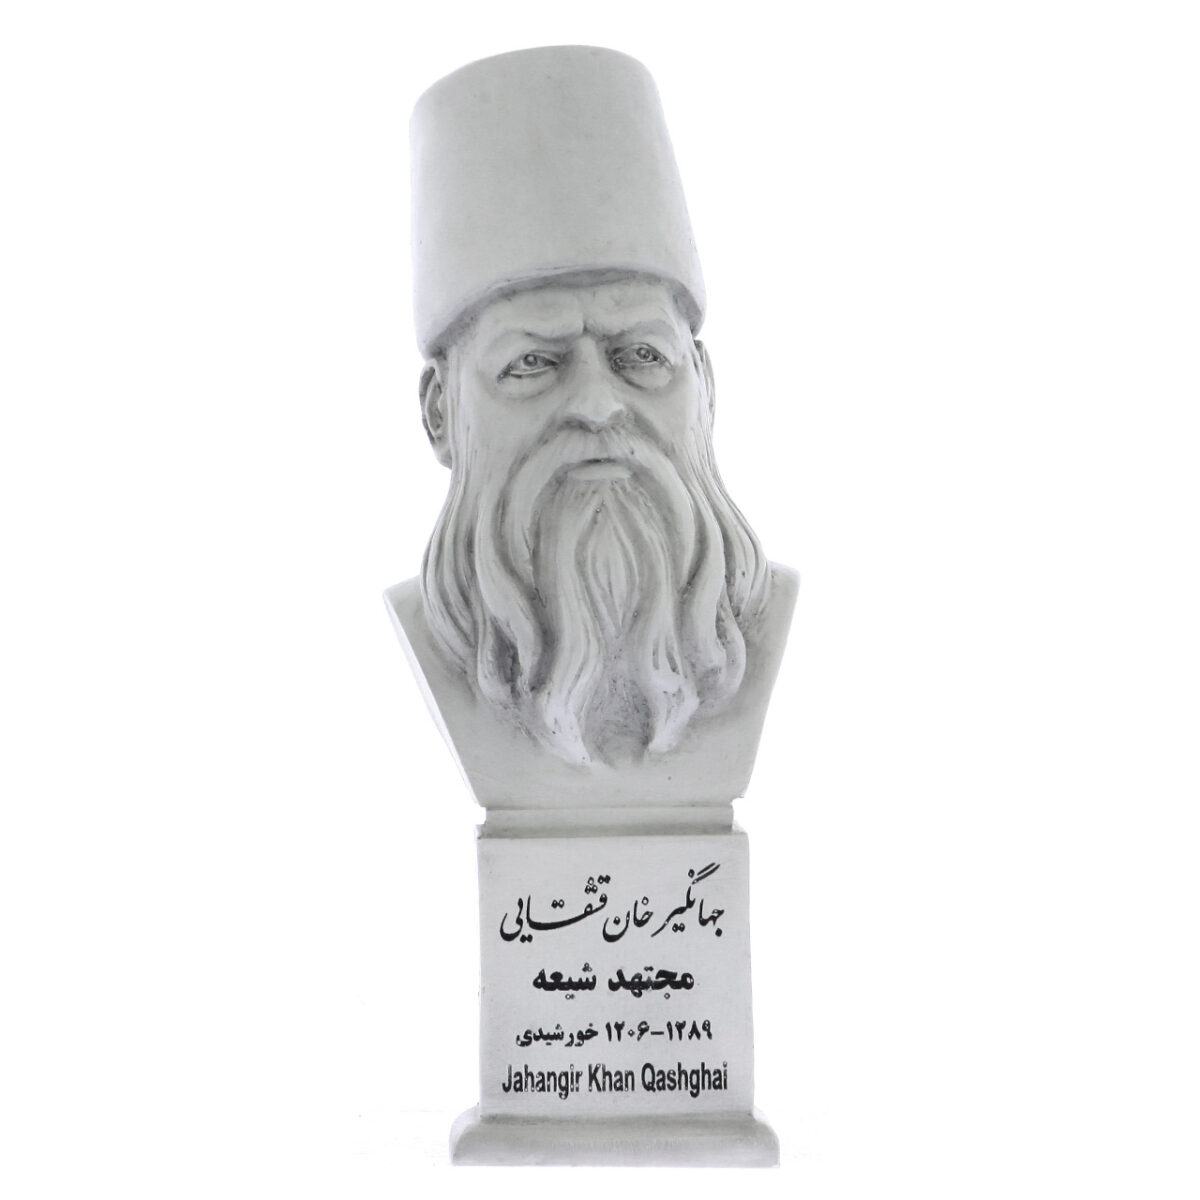 jahangir khan ghashghaei s 1200x1200 - سردیس آیت الله جهانگیر خان قشقایی